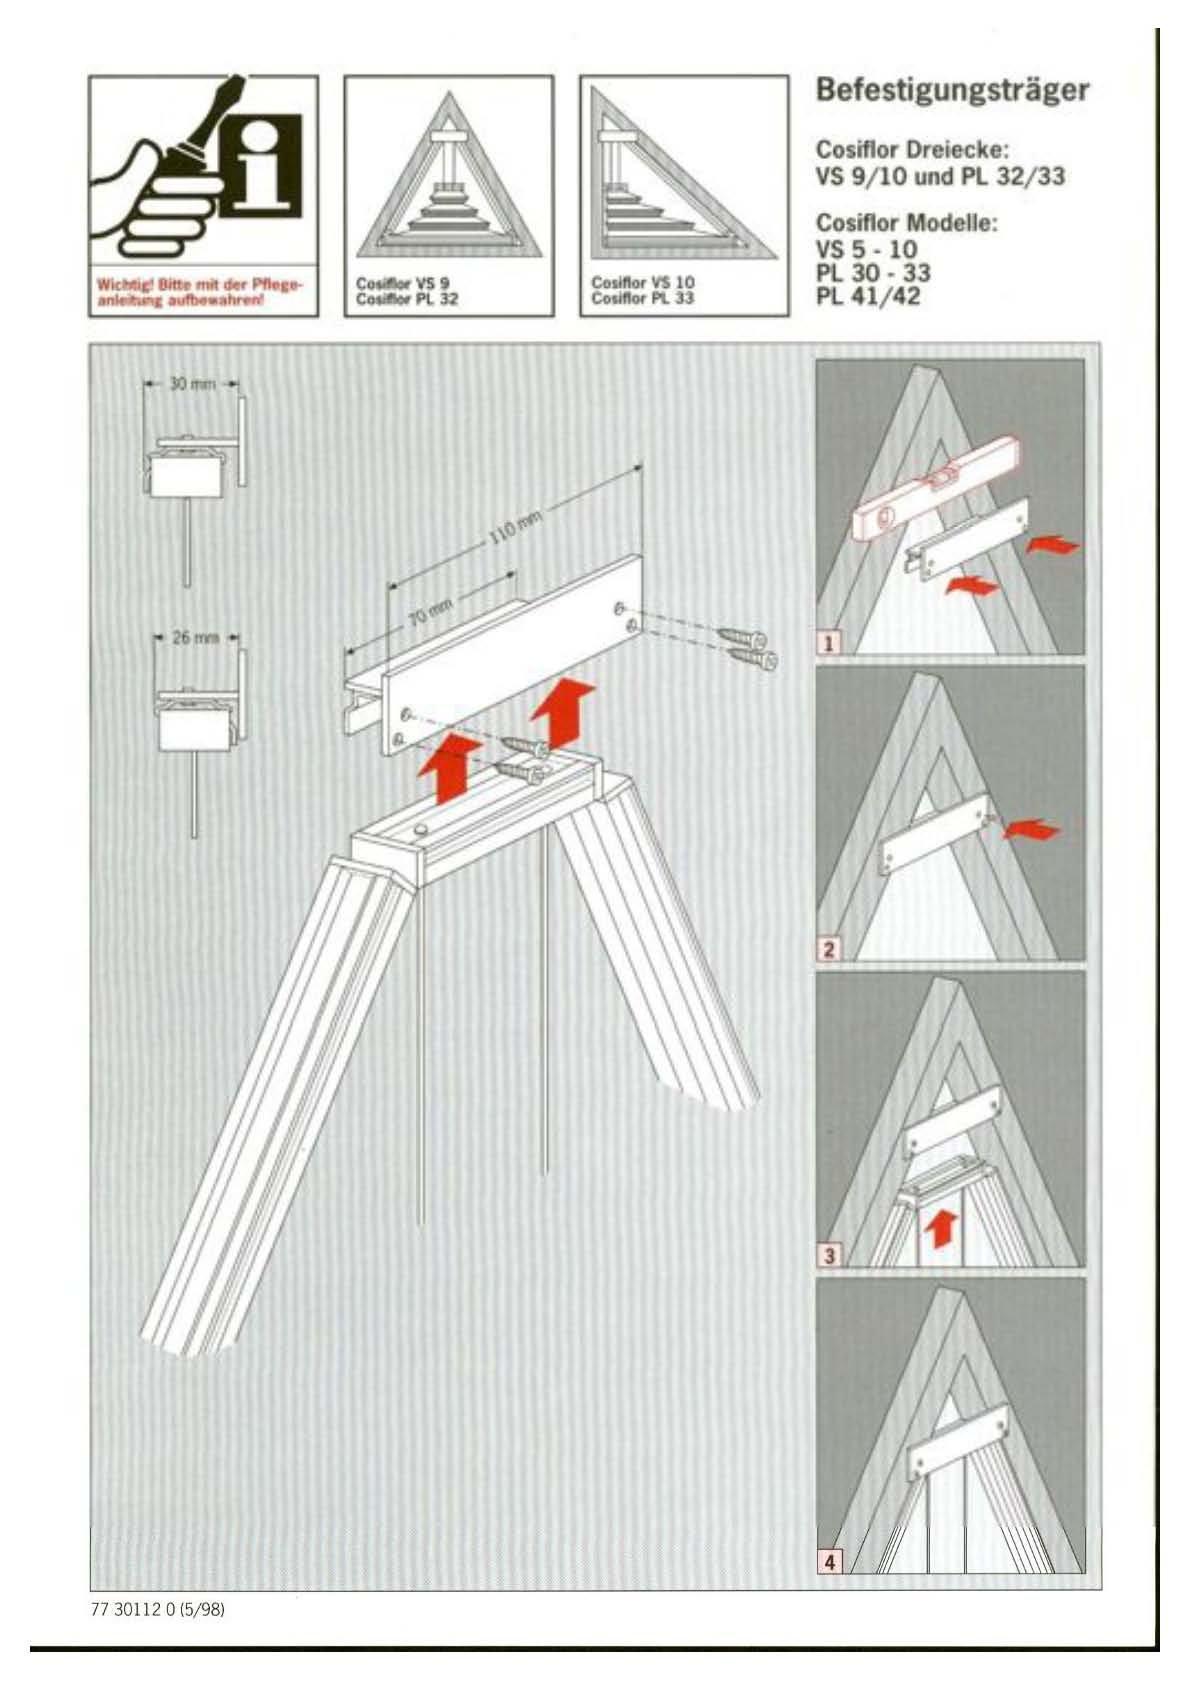 dreiecksfenster plissee cosiflor vs 10. Black Bedroom Furniture Sets. Home Design Ideas